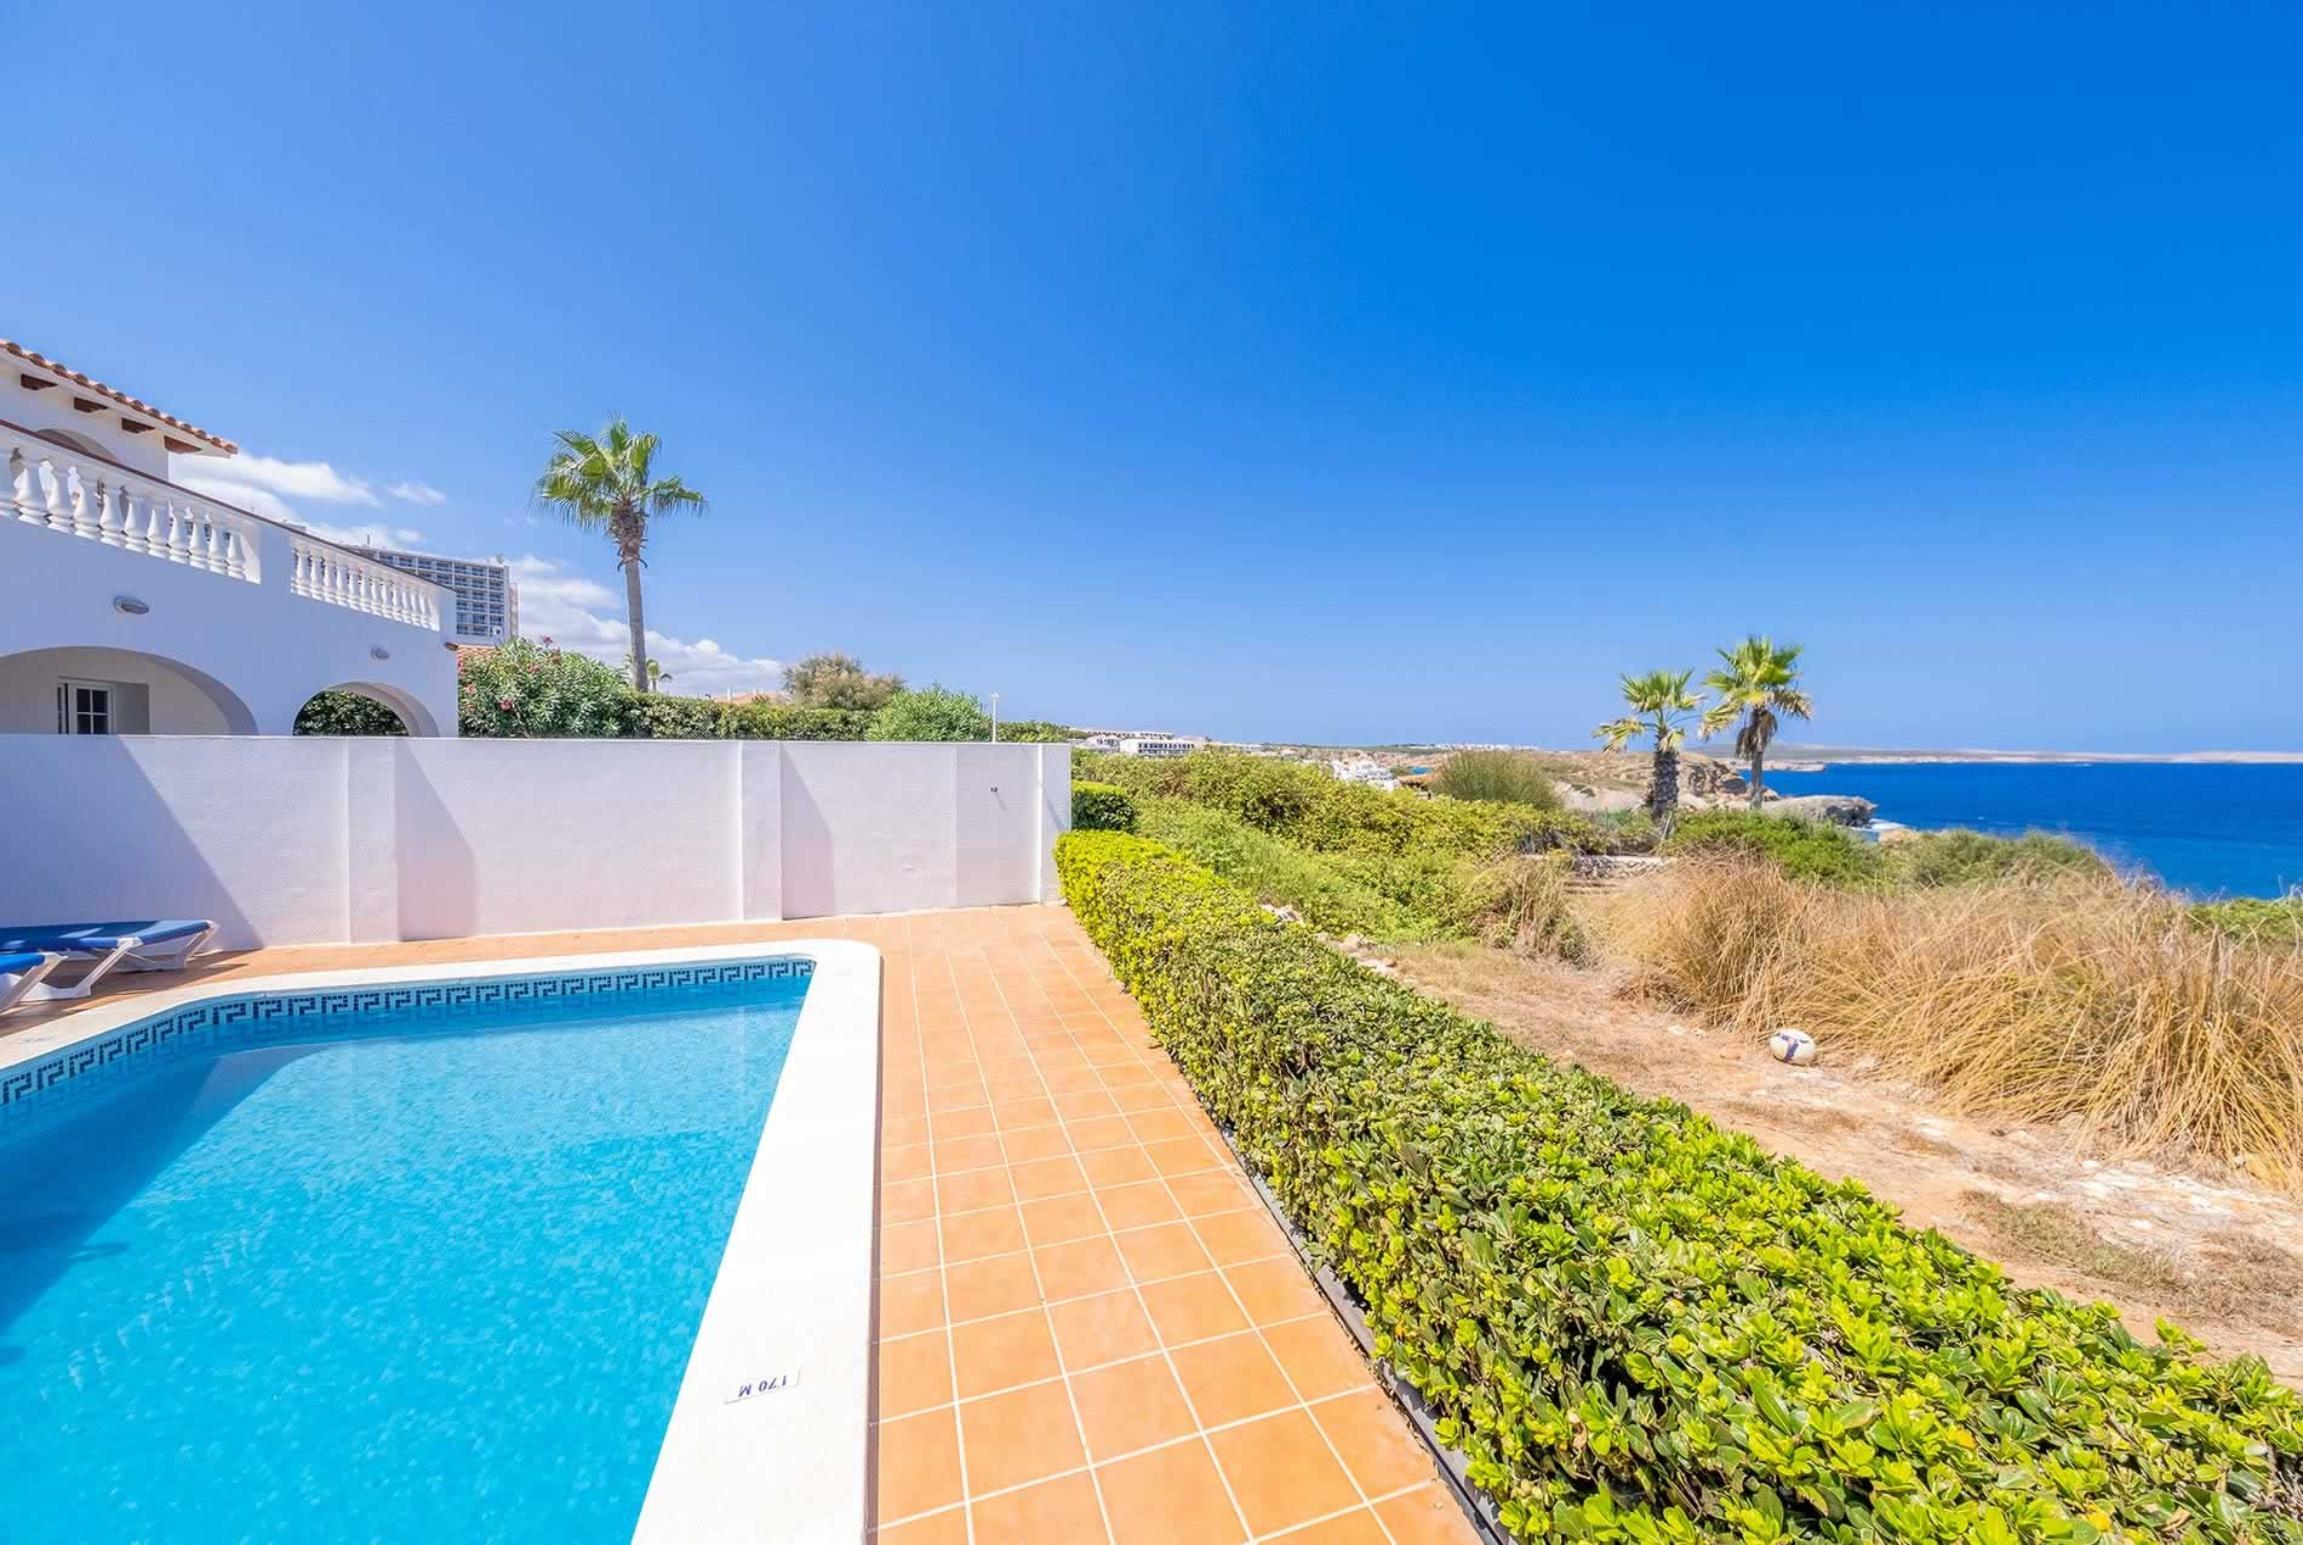 Ferienhaus Bellavista II (2654270), Arenal De'N Castell, Menorca, Balearische Inseln, Spanien, Bild 23